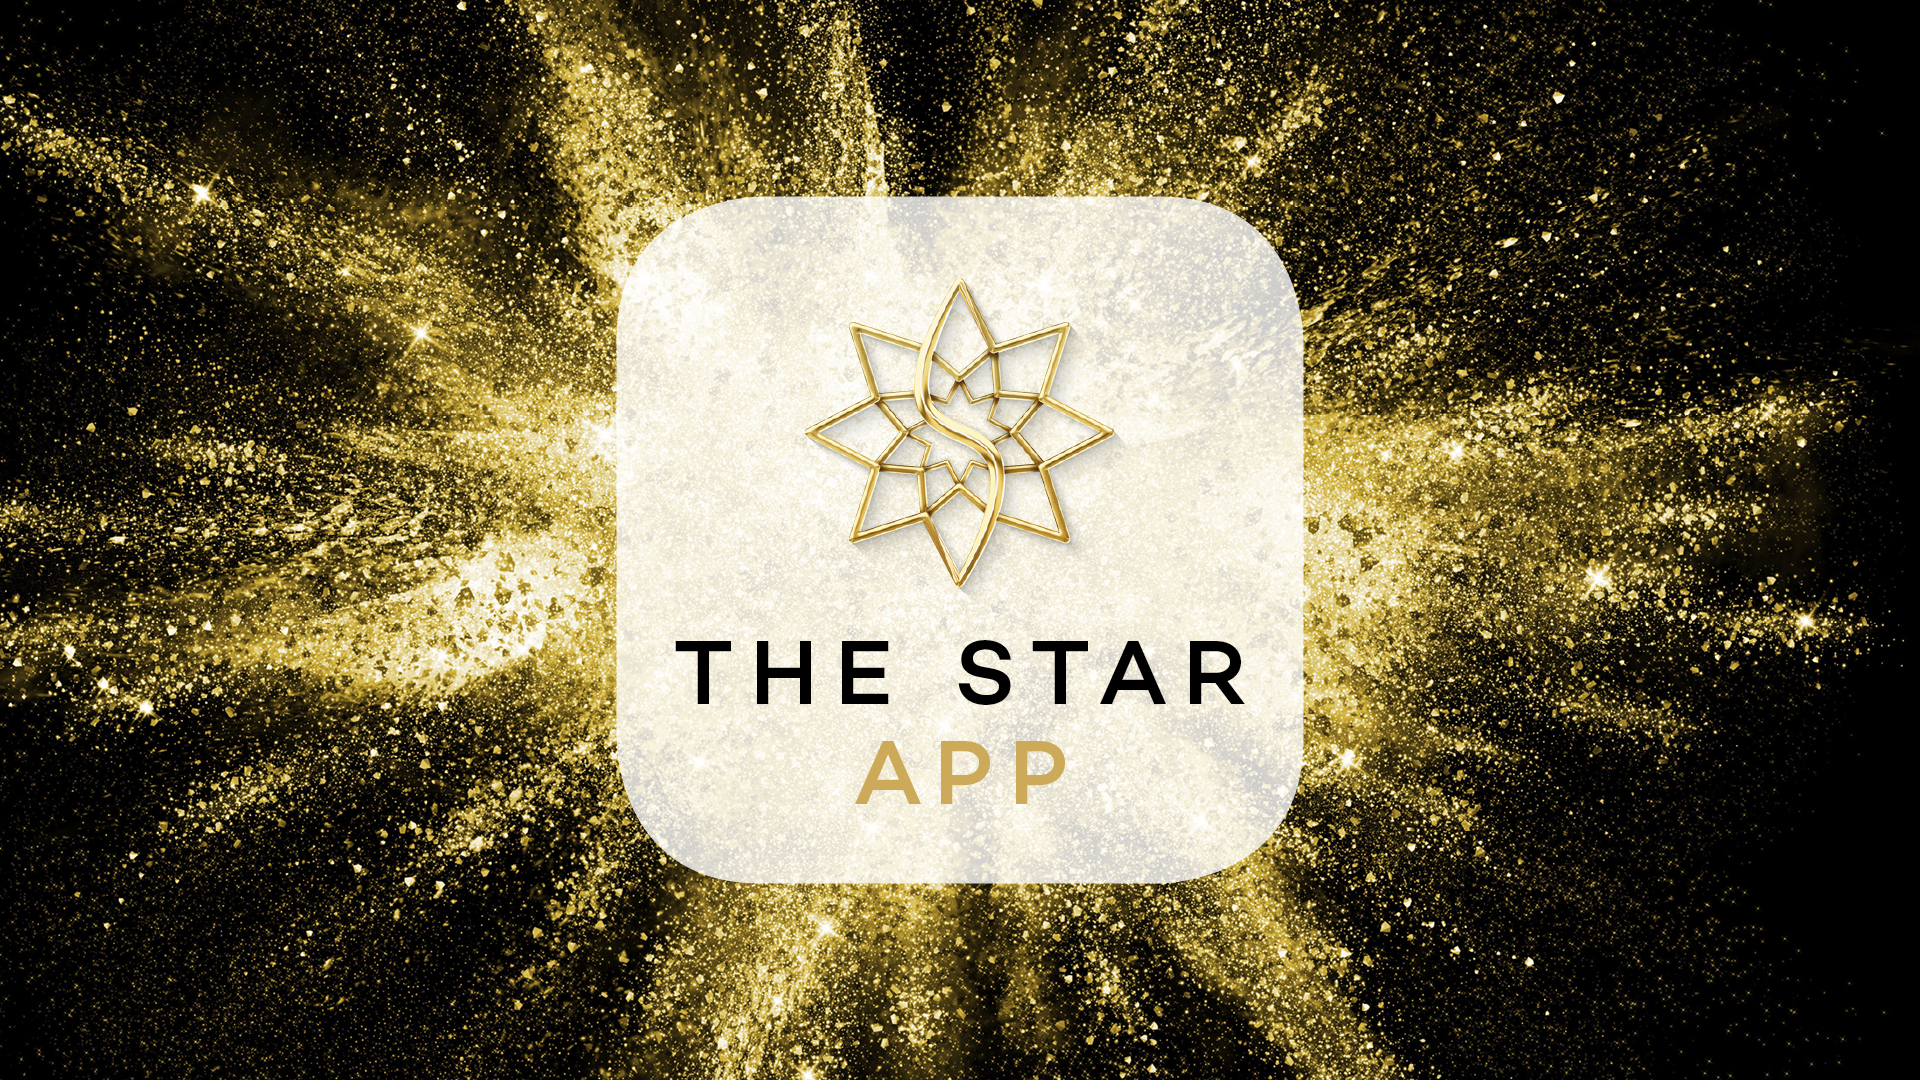 The Star App